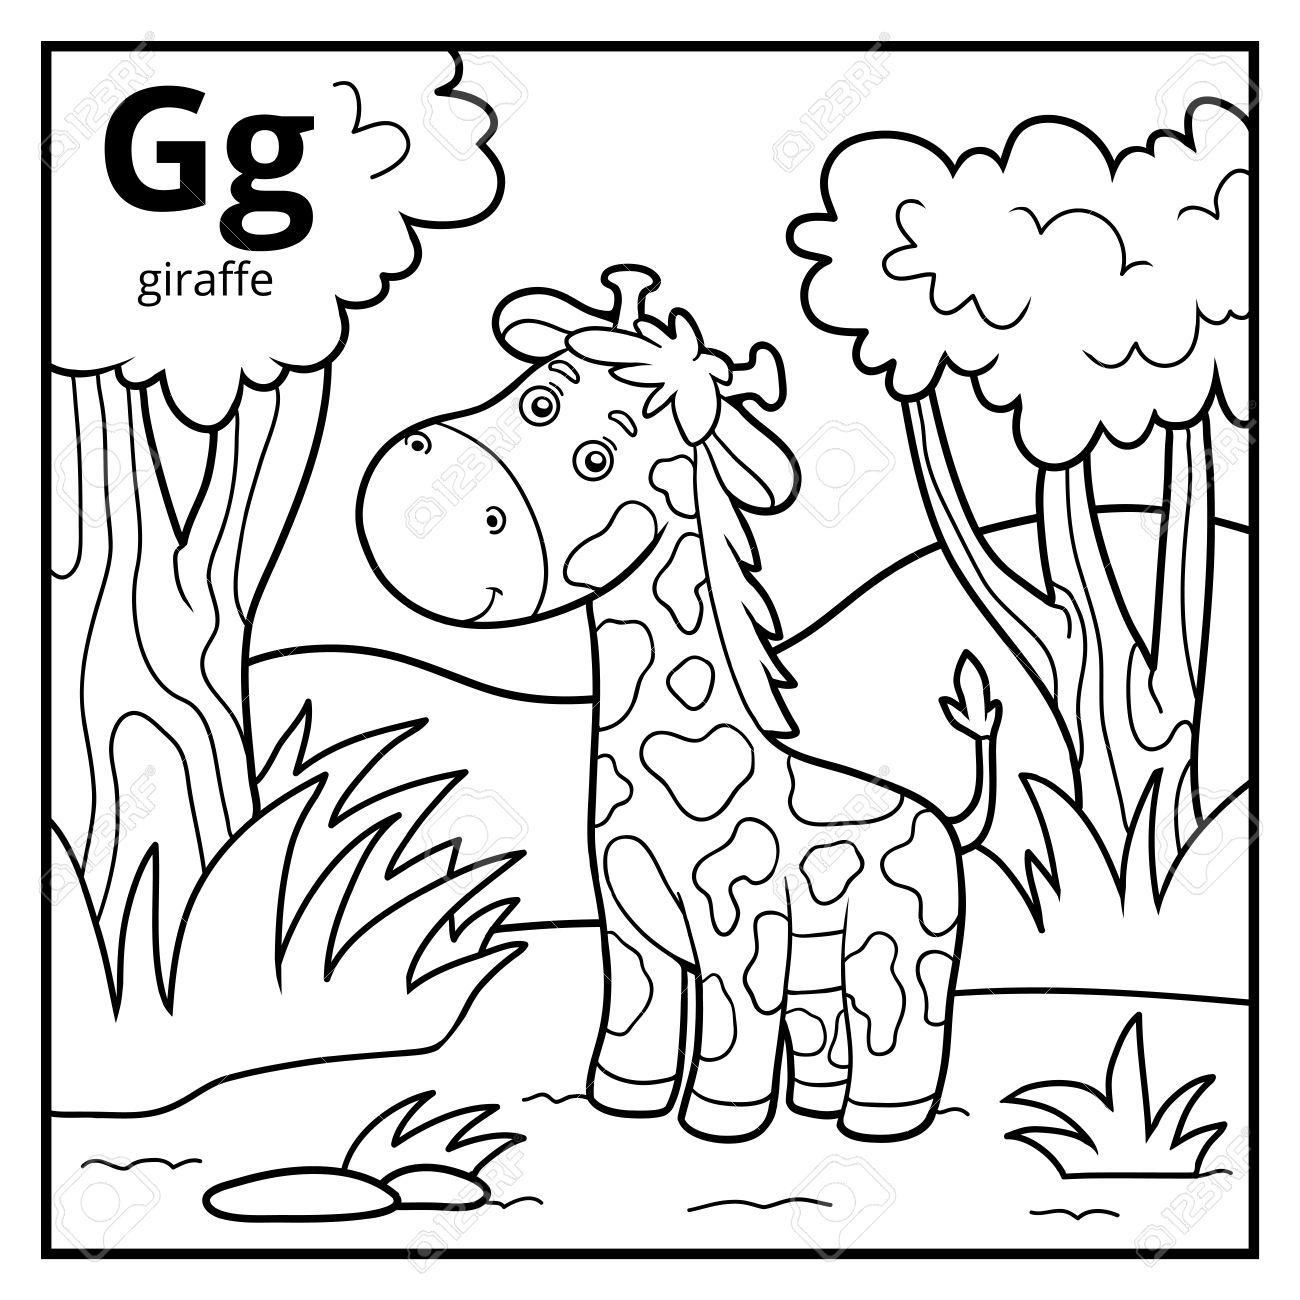 Coloring Book For Children, Colorless Alphabet. Letter G, Giraffe ...